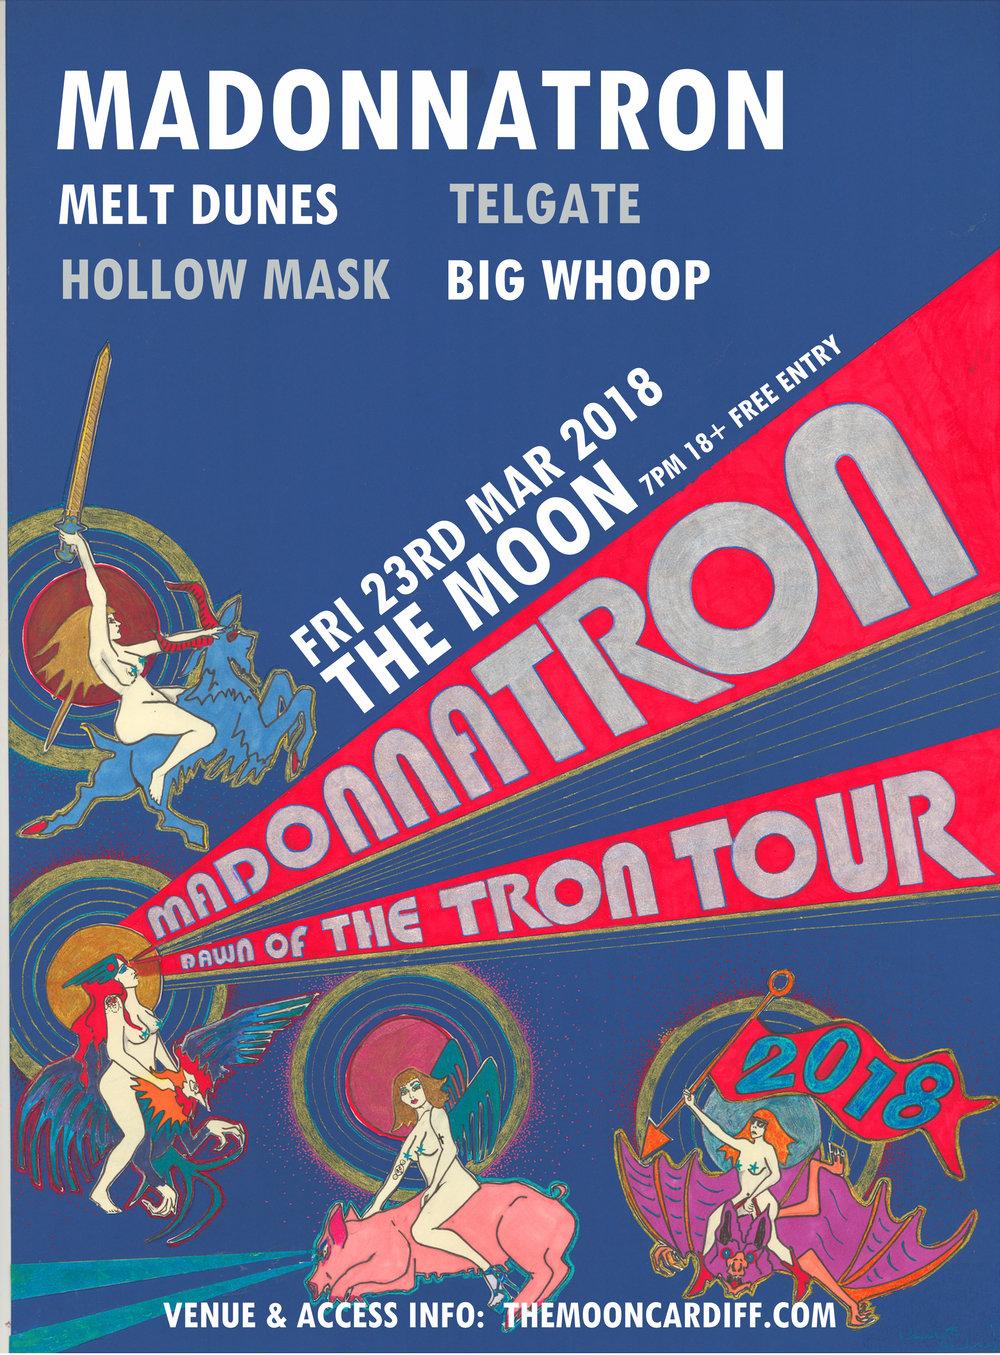 Madonnatron poster.jpg